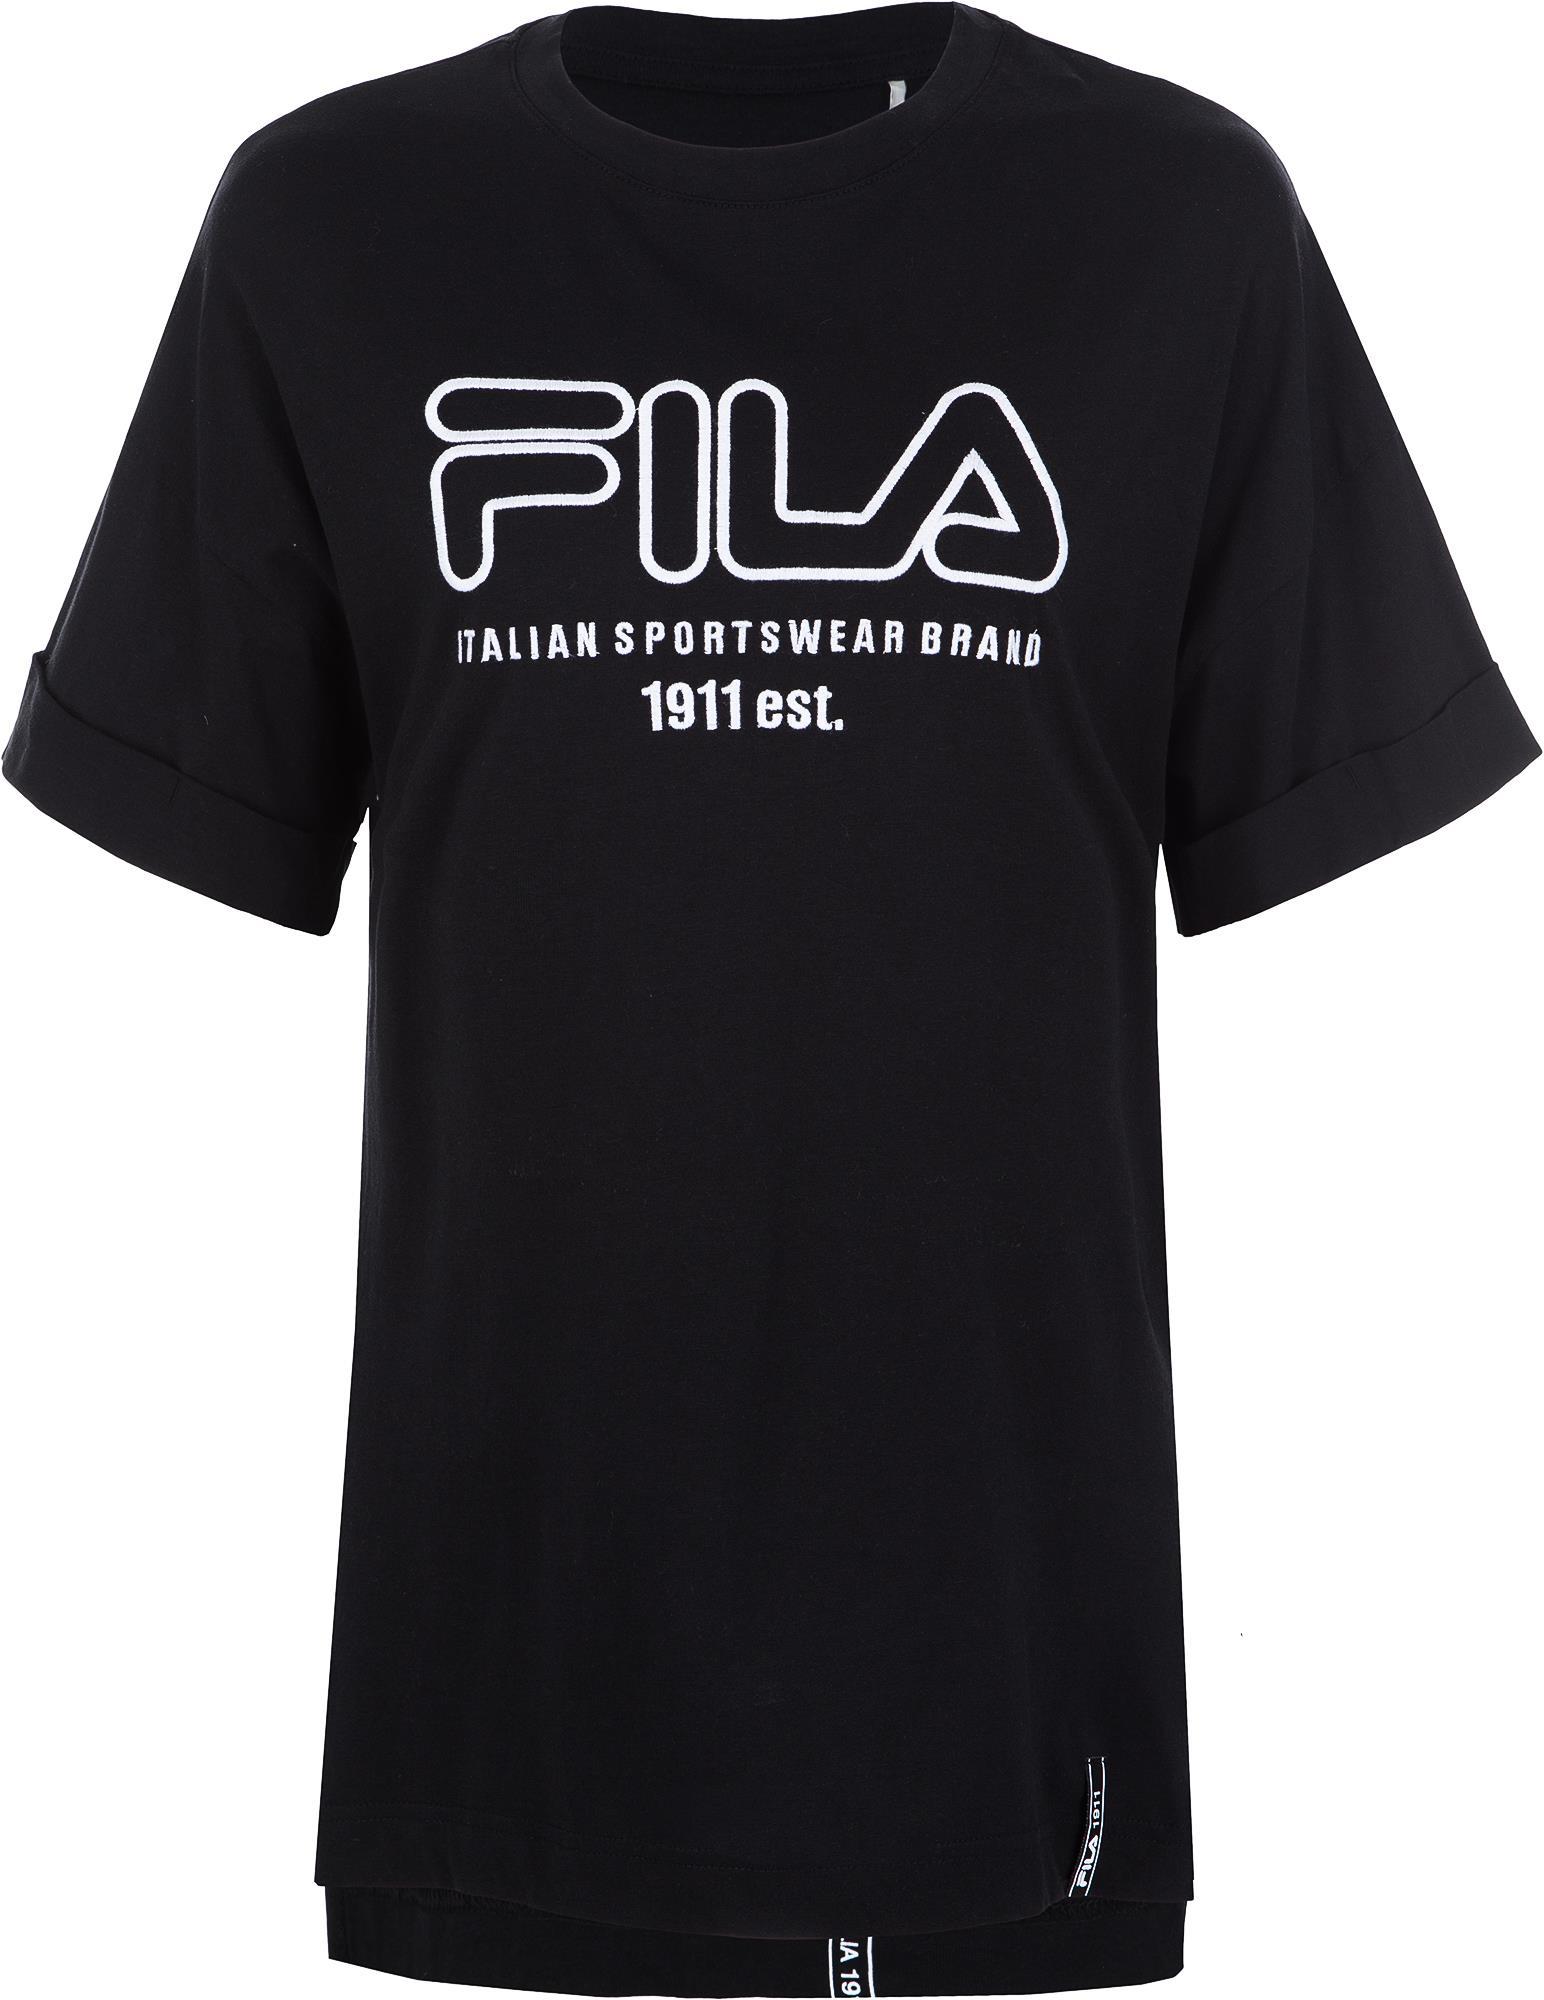 Футболка Fila Womens T-shirt